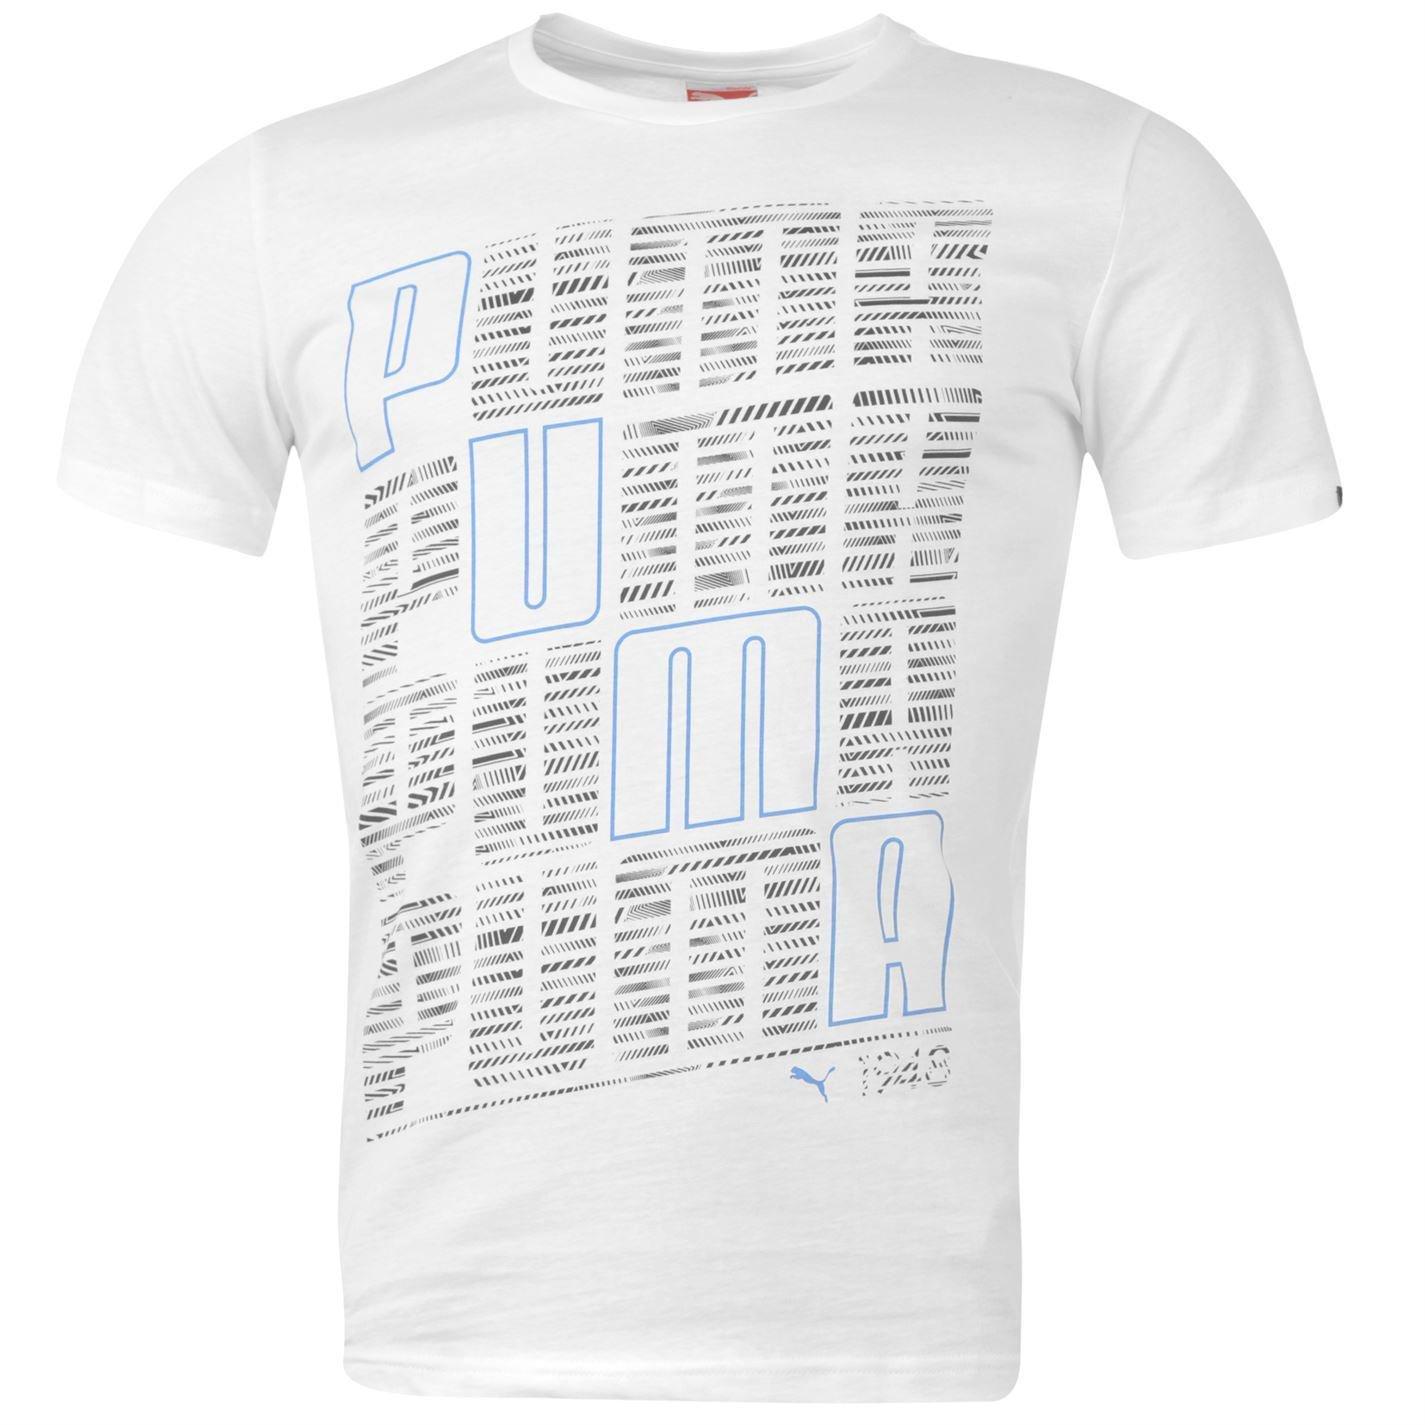 Puma Mens QTT Wording T Shirt Short Sleeve Crew Neck Tee Top Clothing Wear